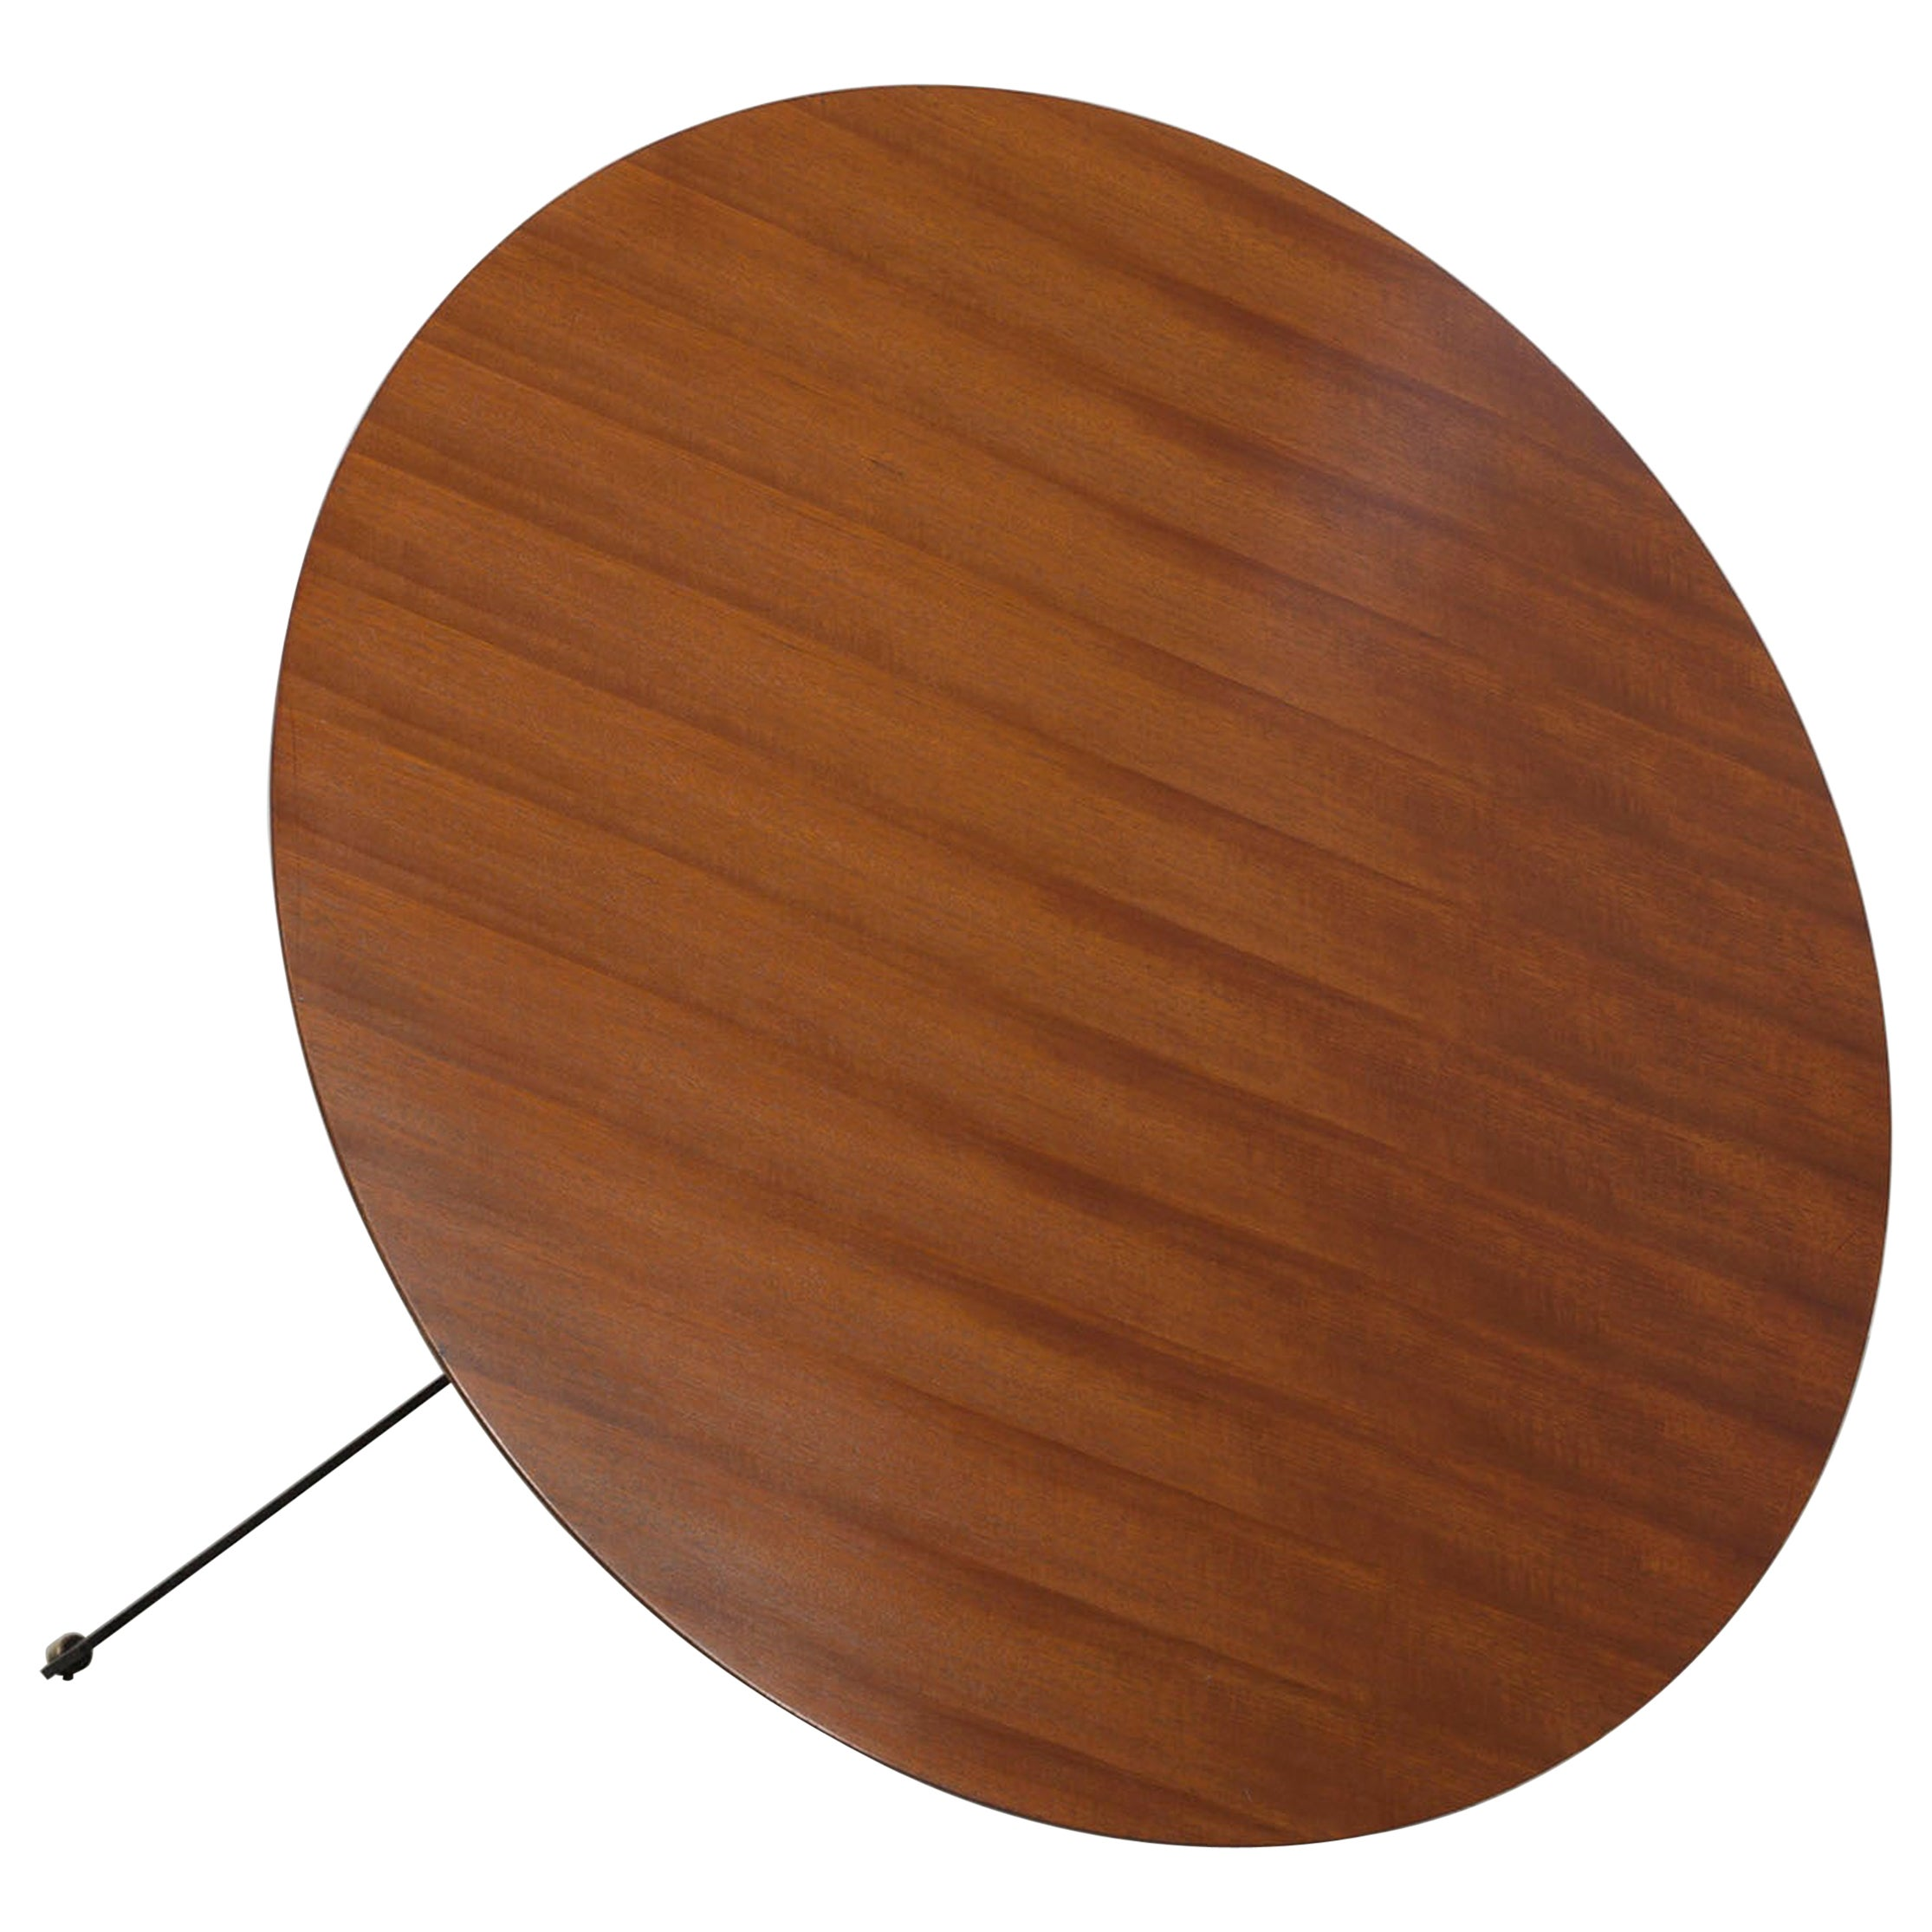 Height Adjustable Round Teakwood Table from the Italian, 1950s